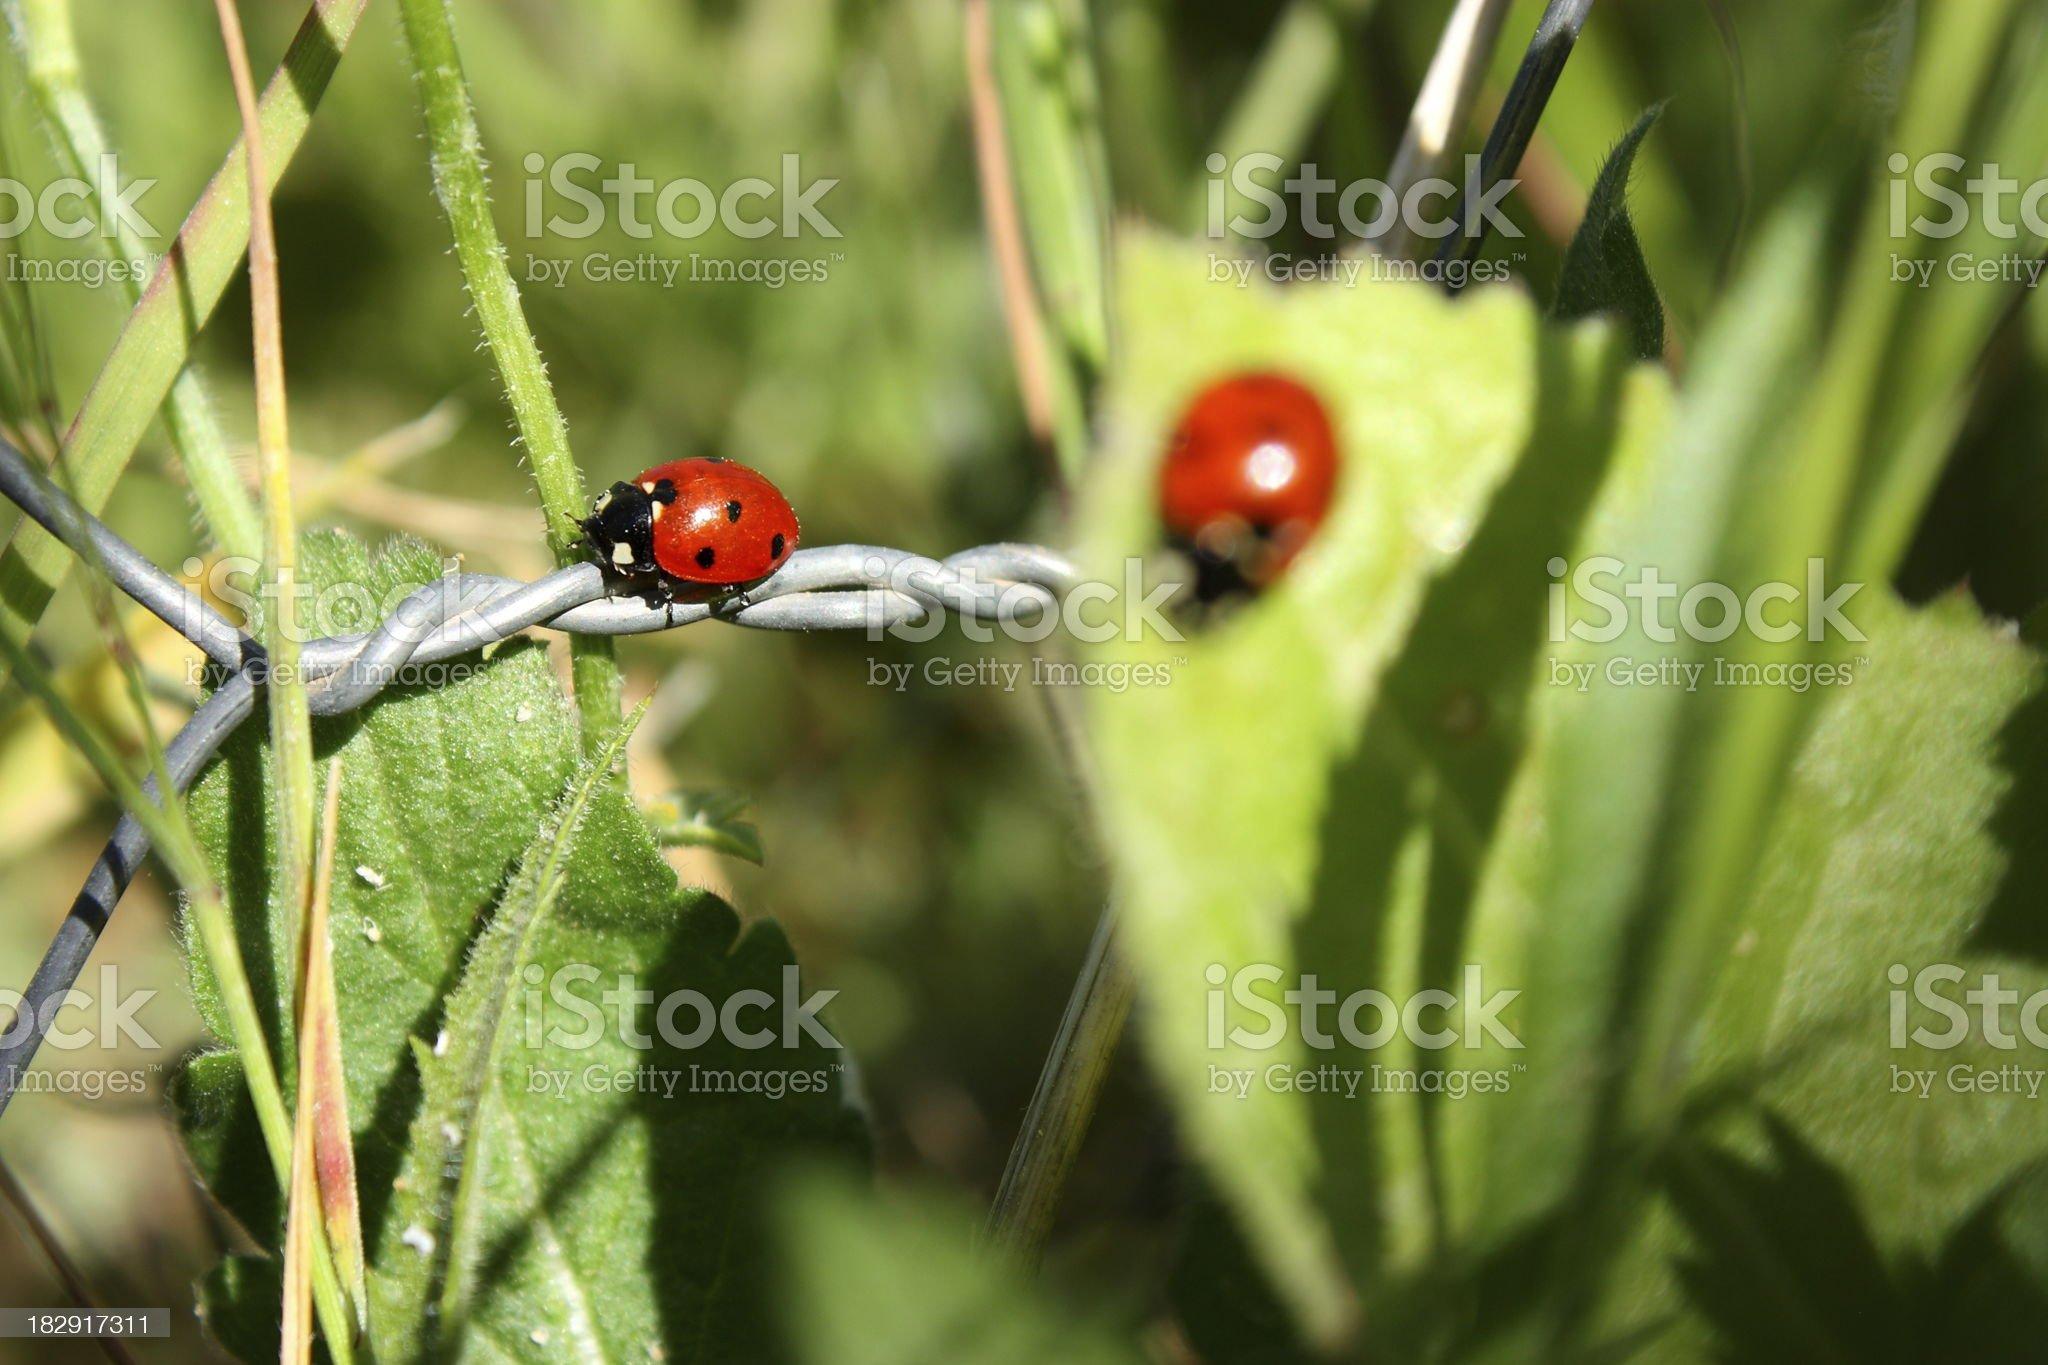 Meadow and ladybug royalty-free stock photo